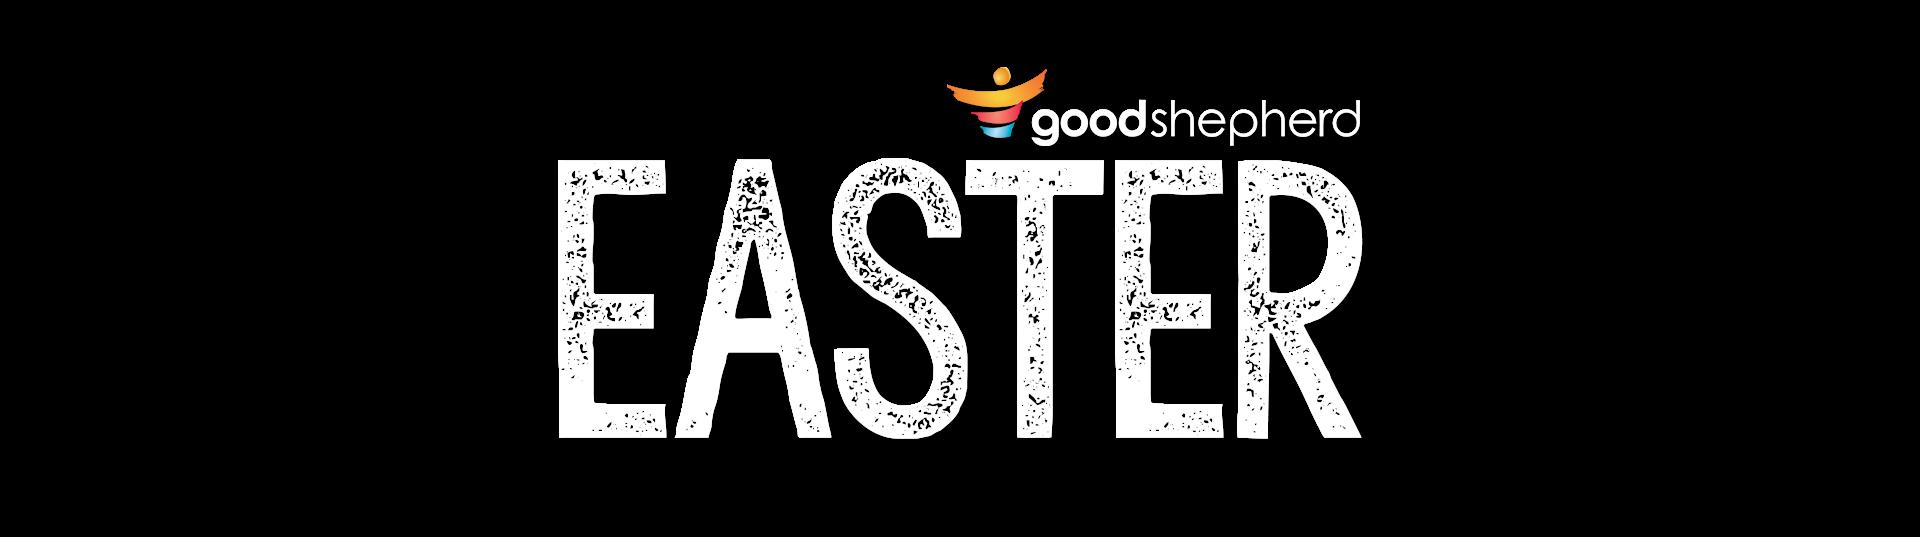 Good shepherd united methodist. Easter clipart worship